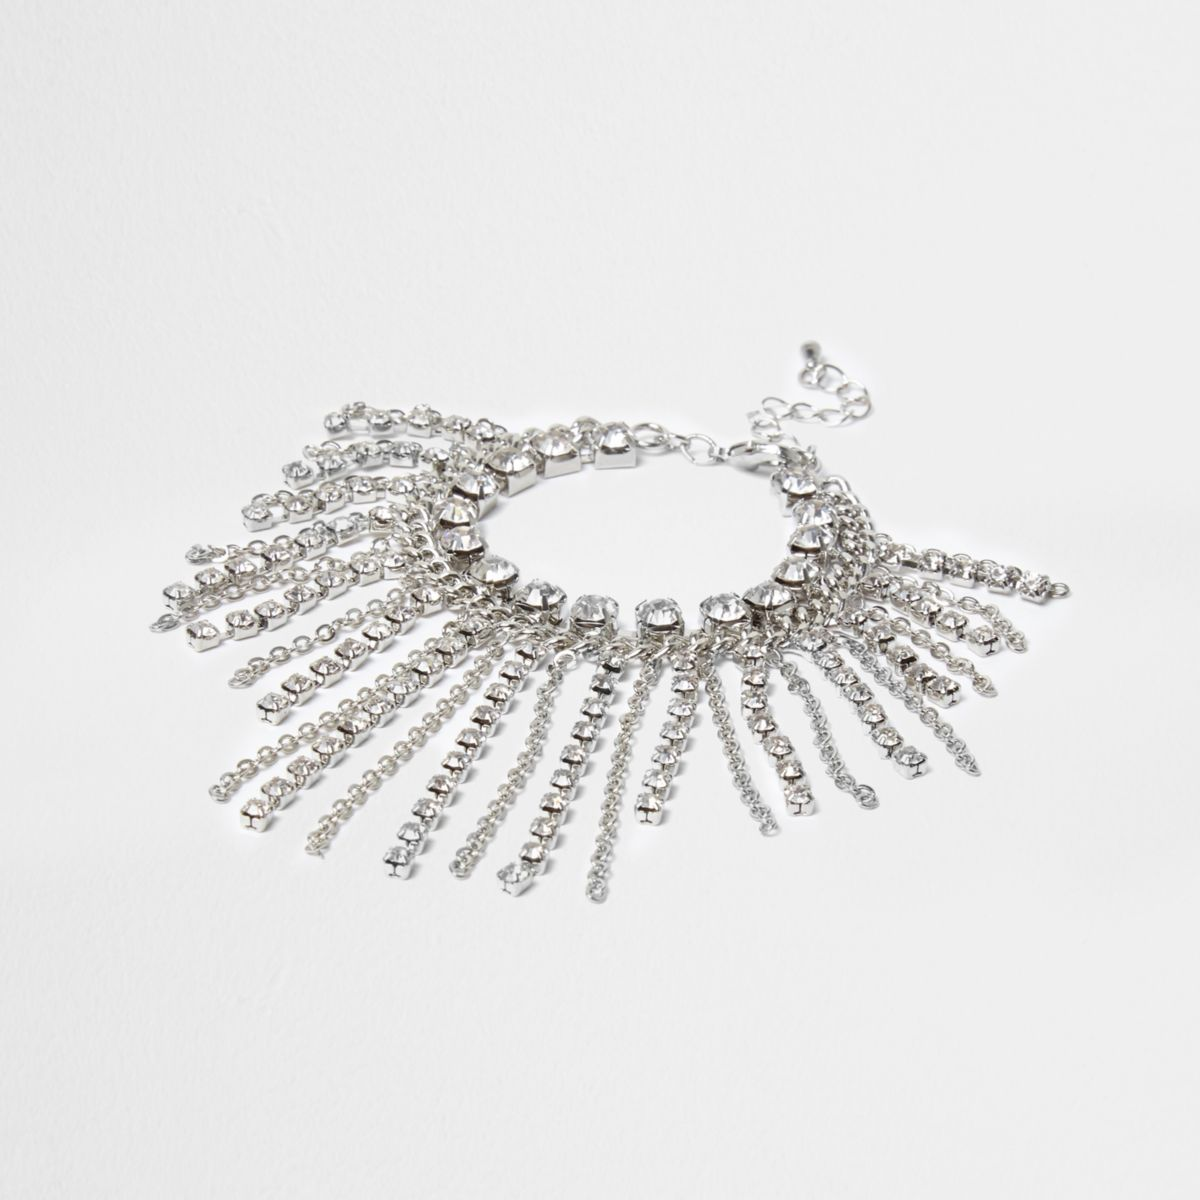 Silver cup chain tassle rhinestone bracelet